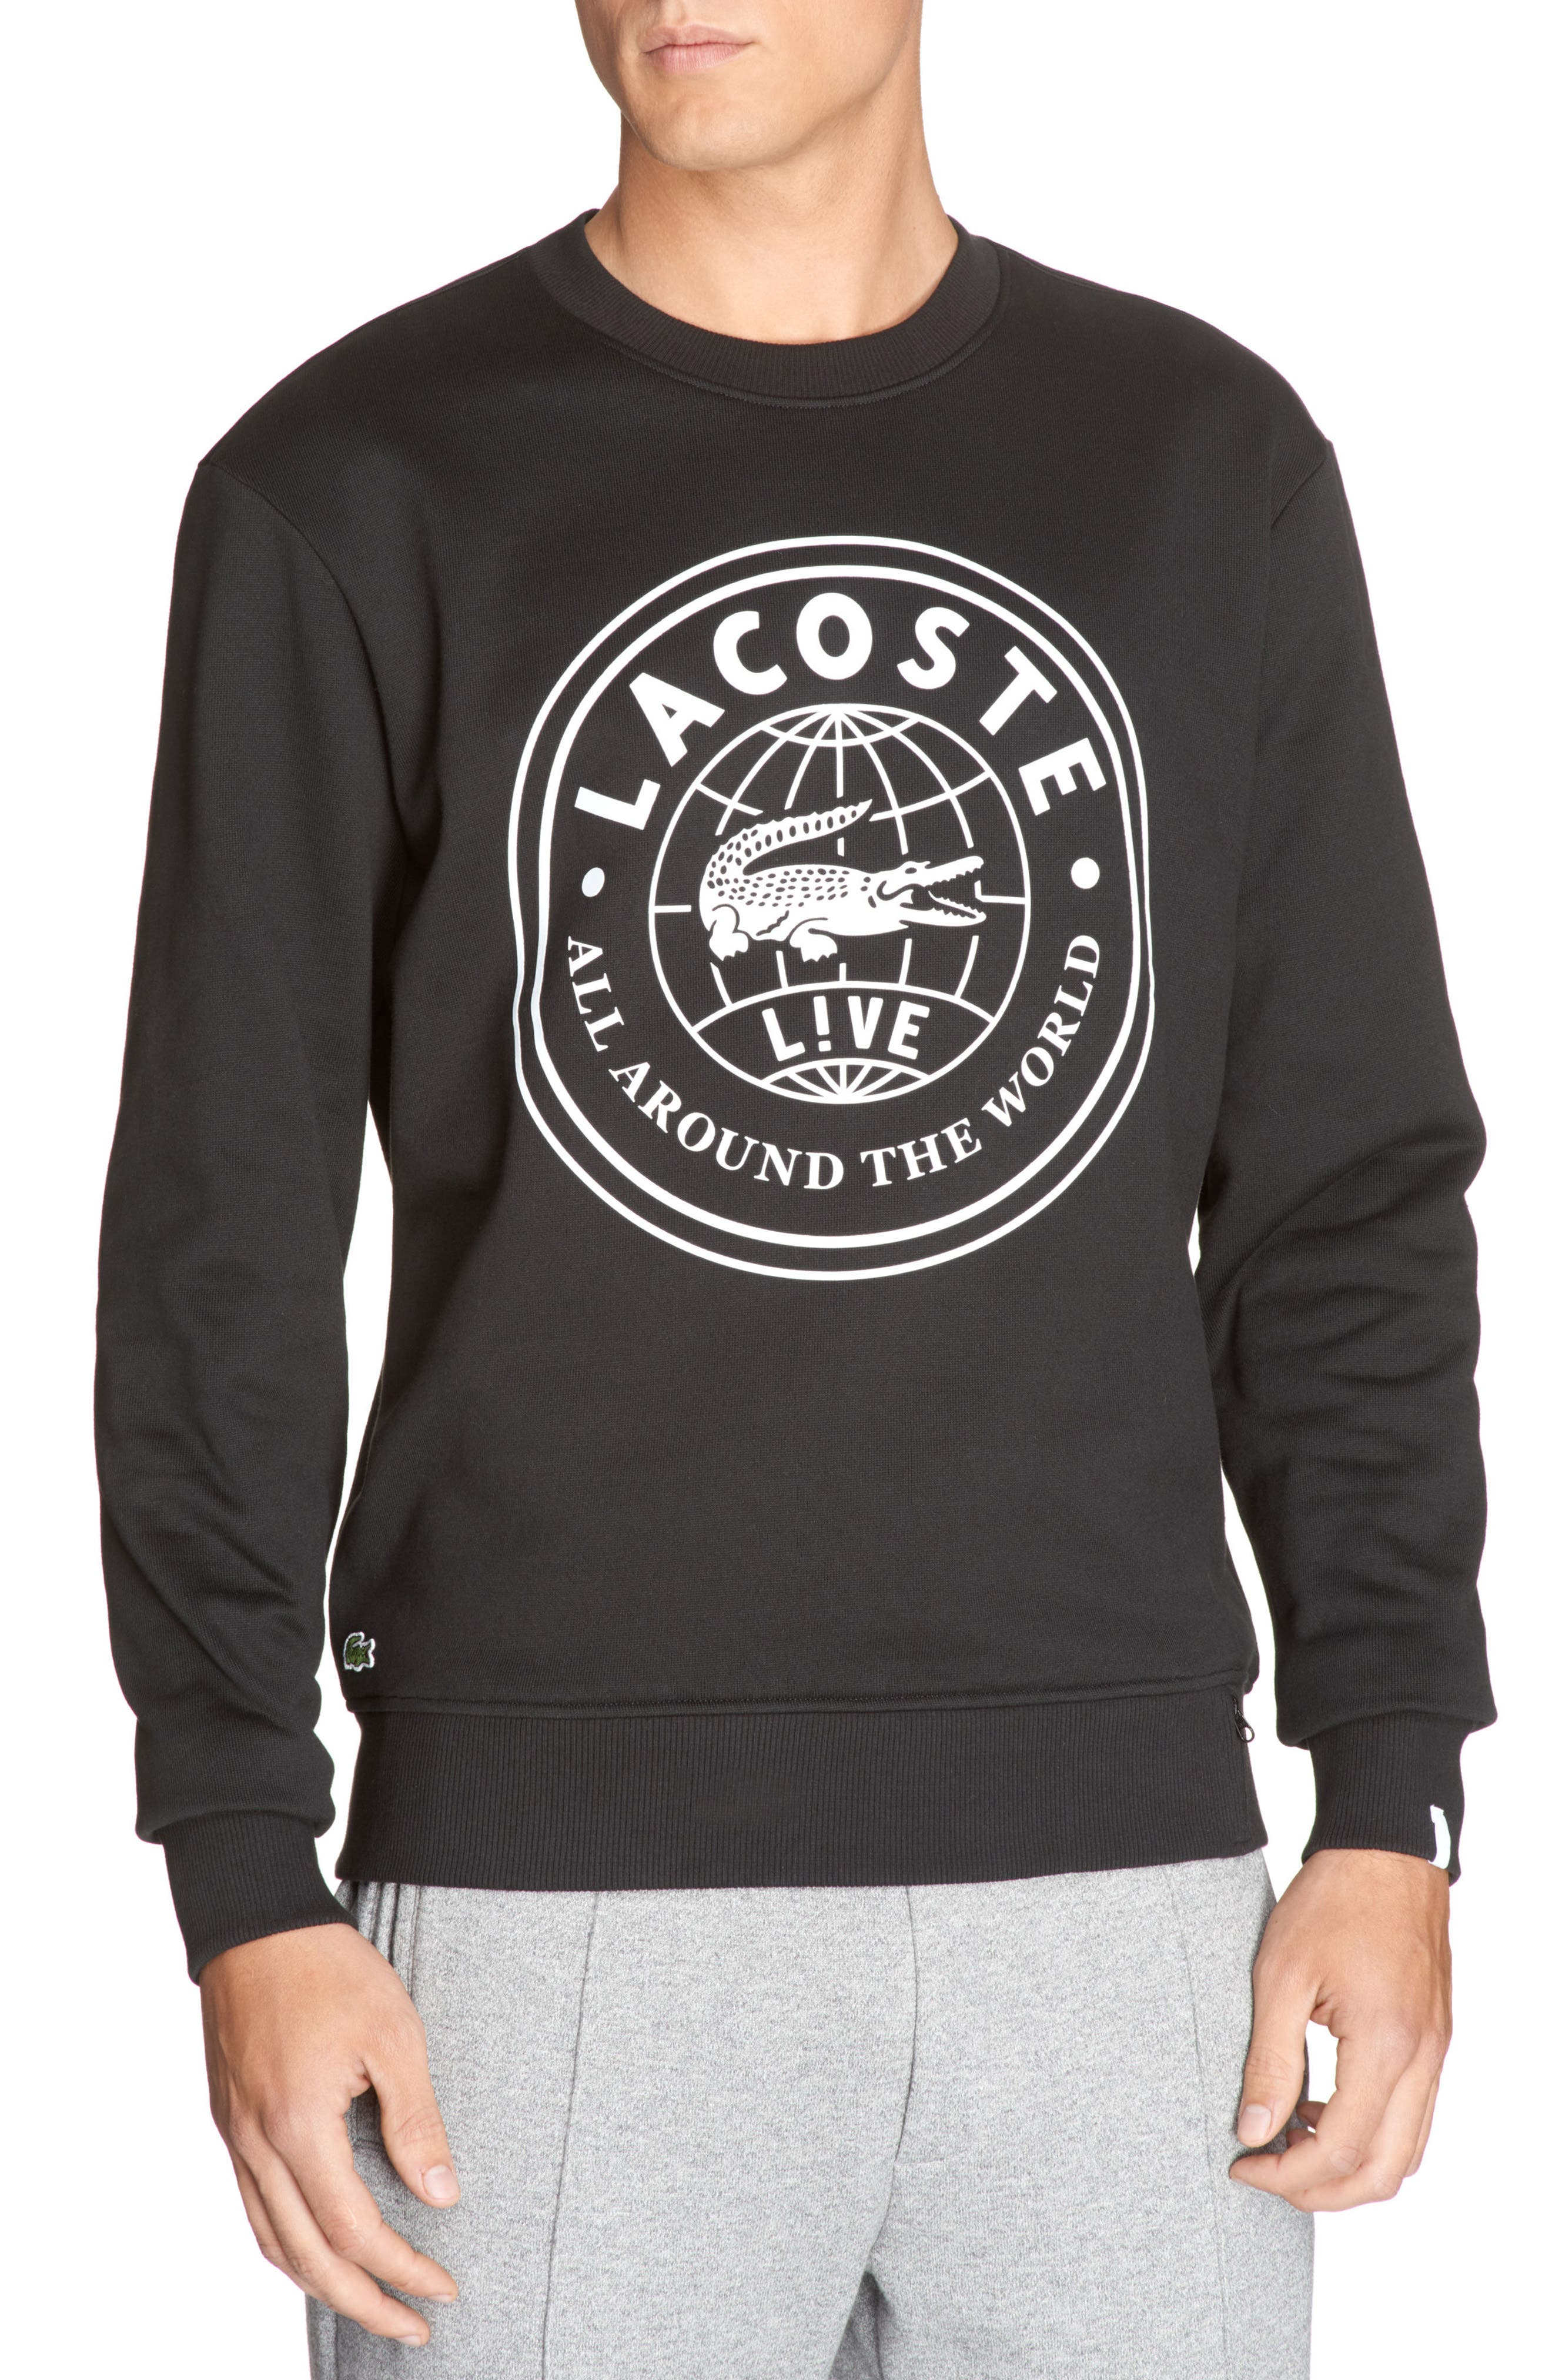 Molleton Worldwide Sweatshirt,                             Main thumbnail 1, color,                             003